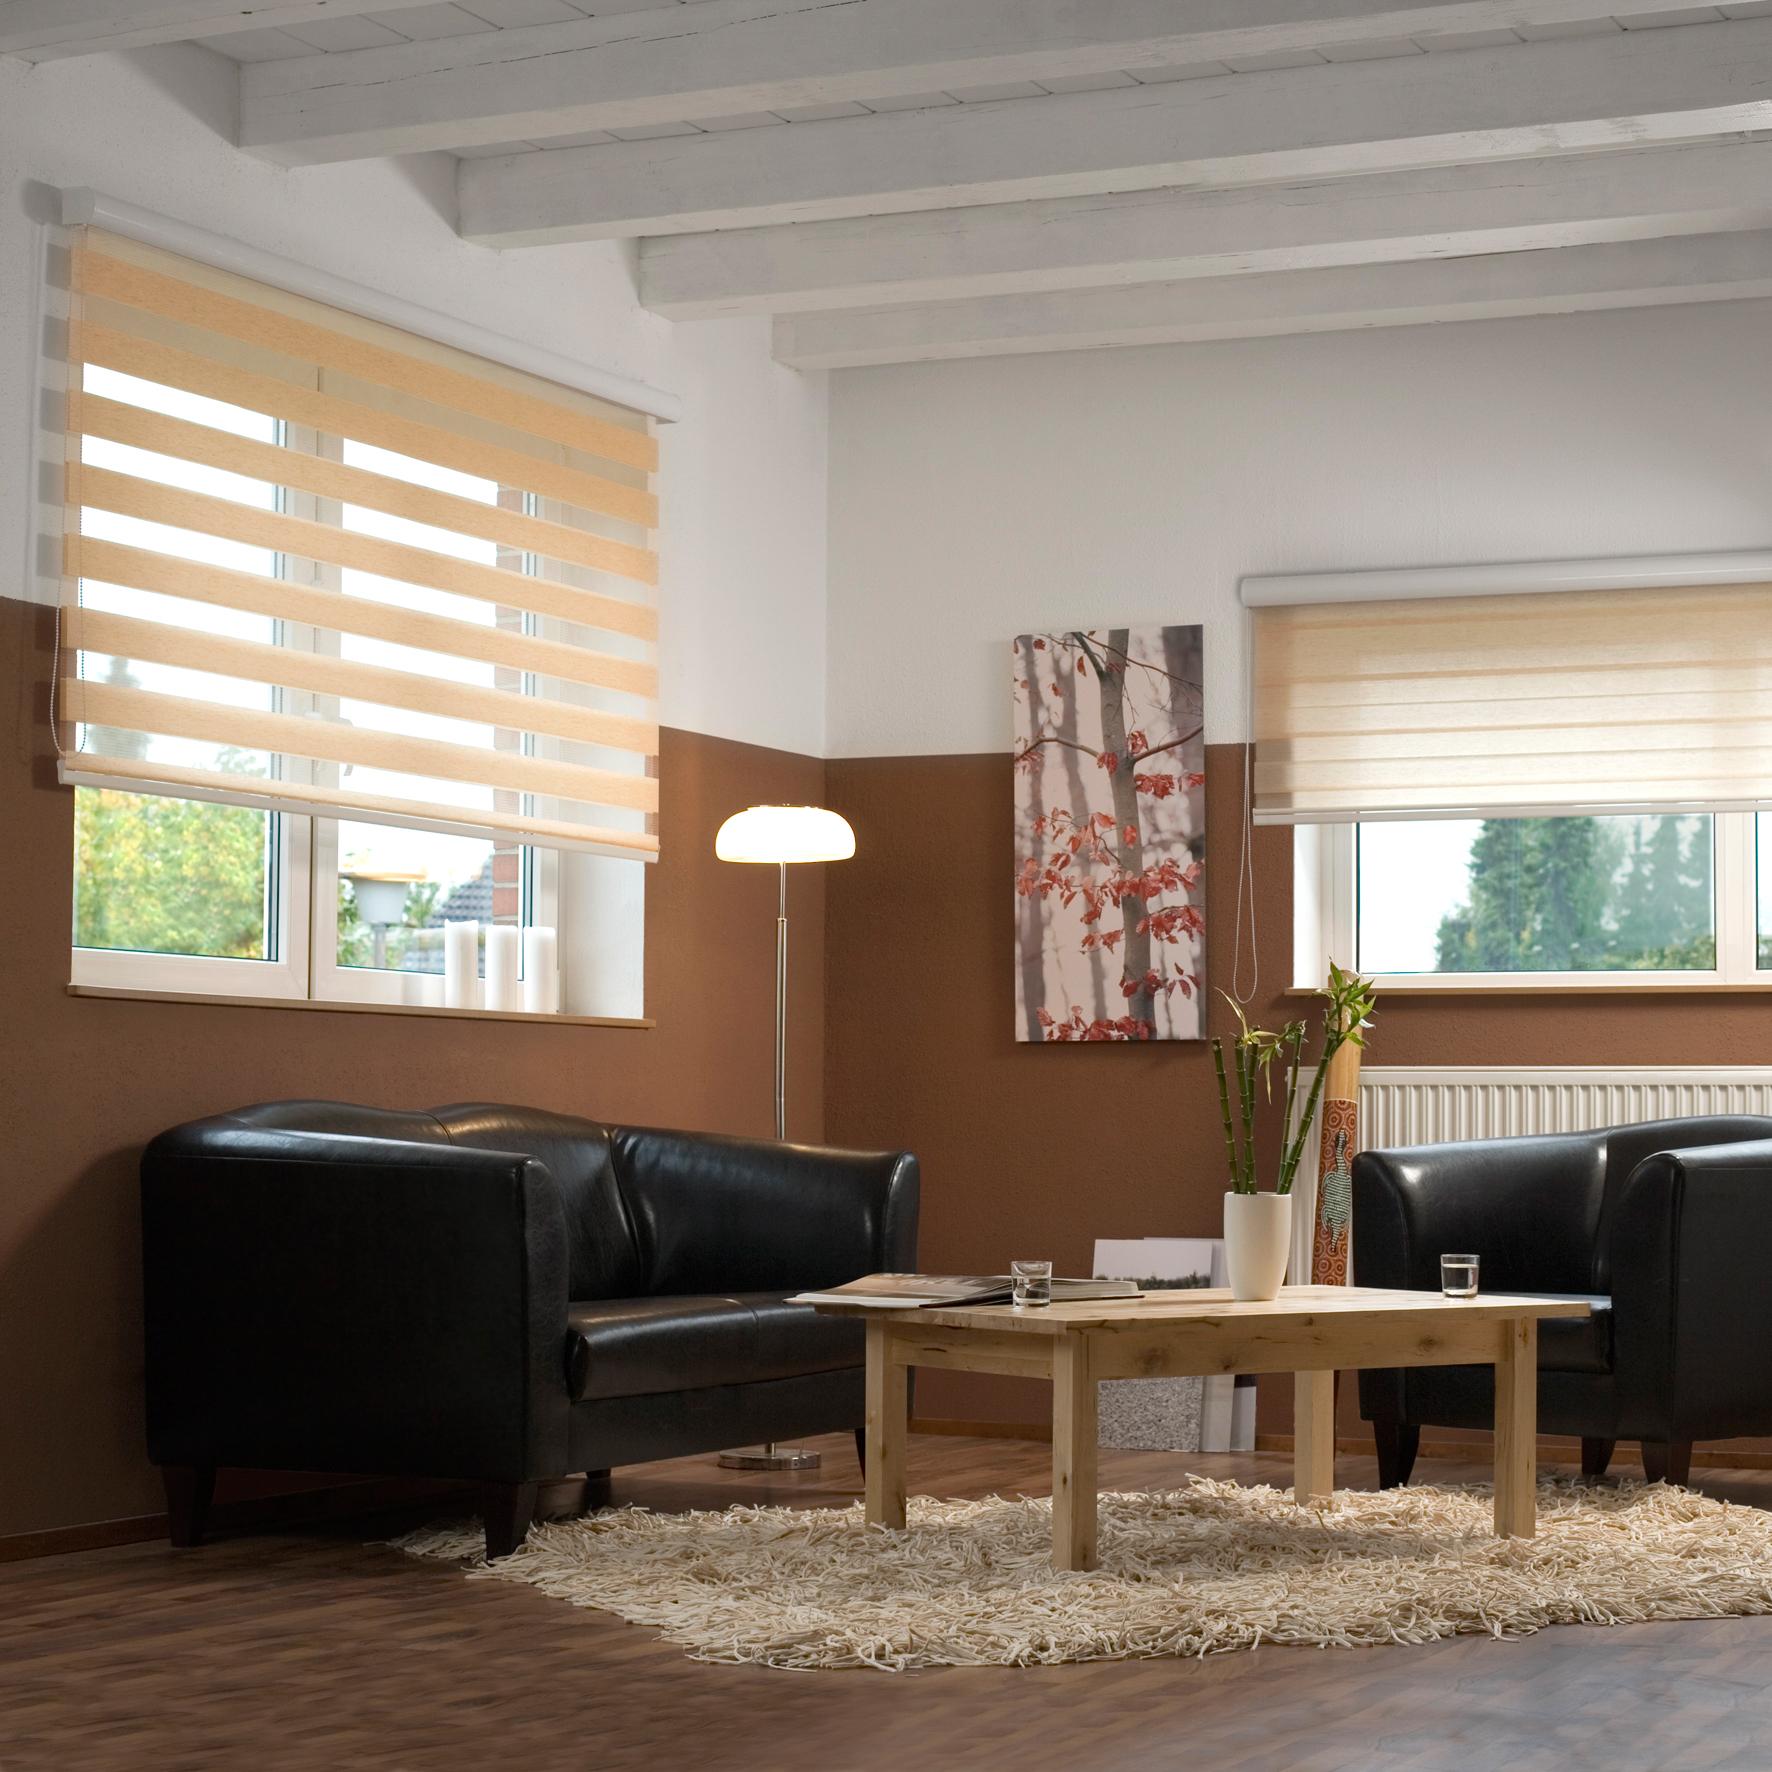 store nuit et jour. Black Bedroom Furniture Sets. Home Design Ideas